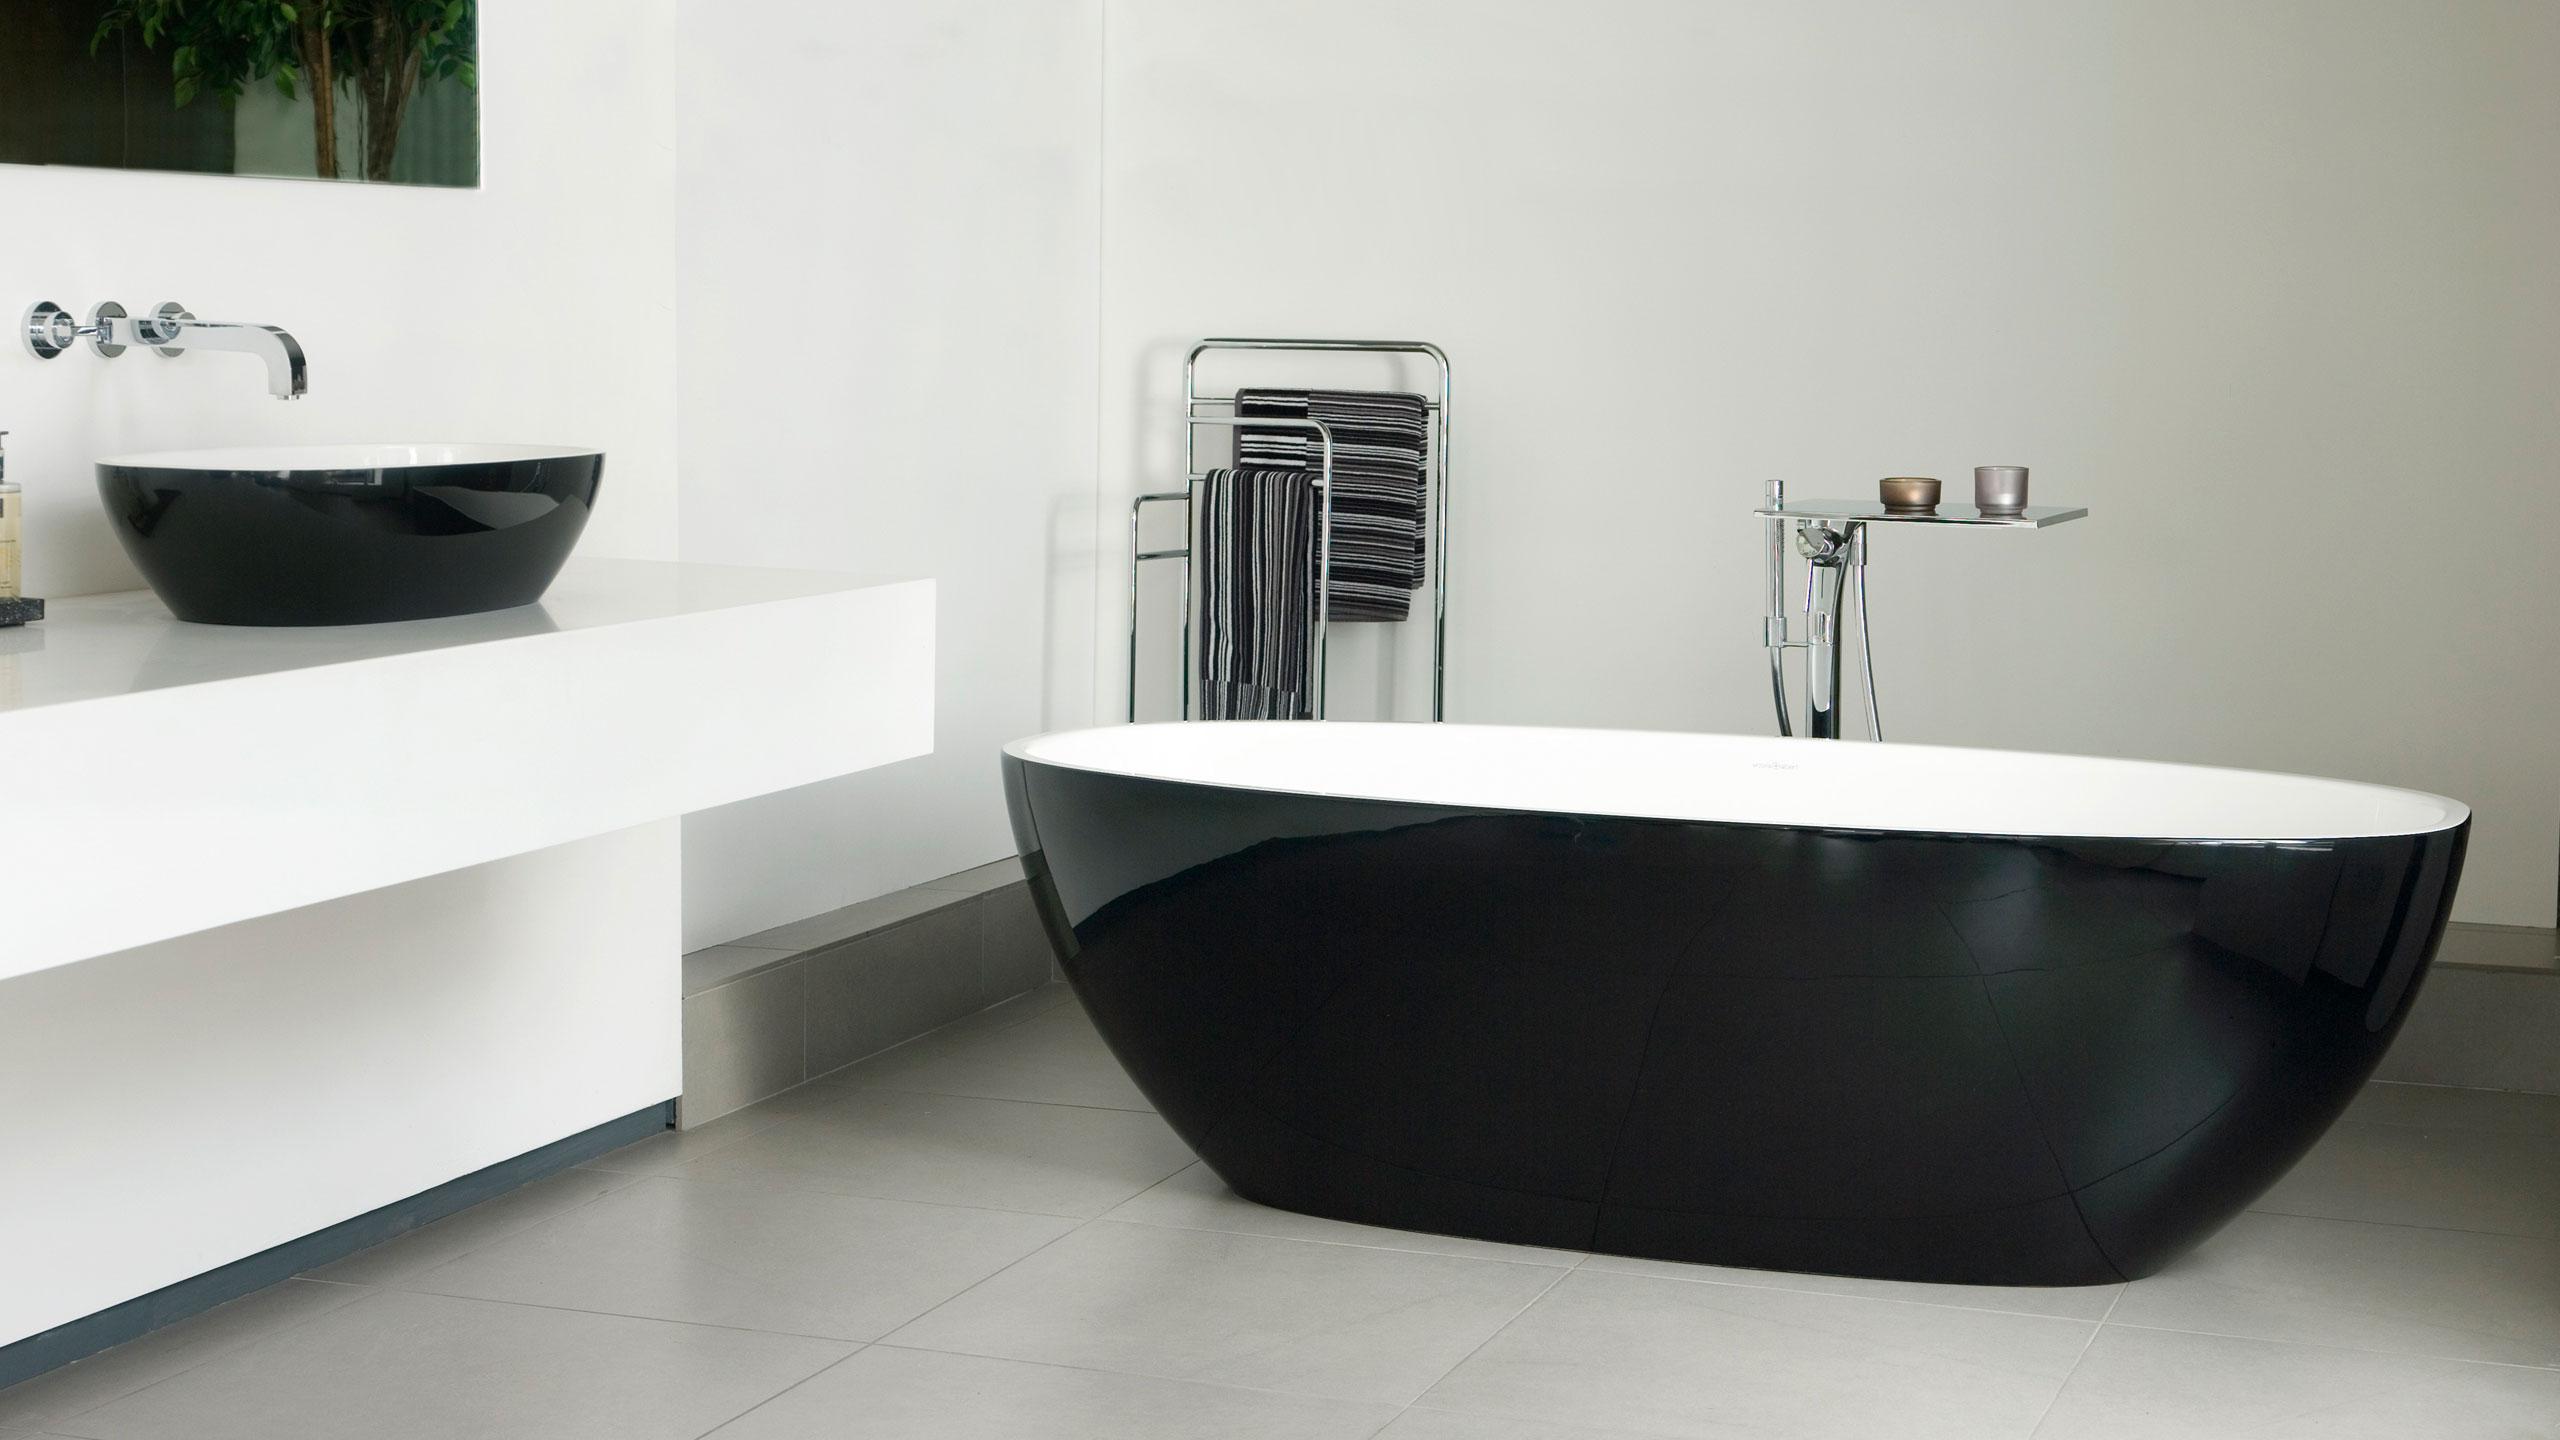 https://designerpages.s3.amazonaws.com/assets/61000191/Barcelona_Gallery_3black_EU.jpg